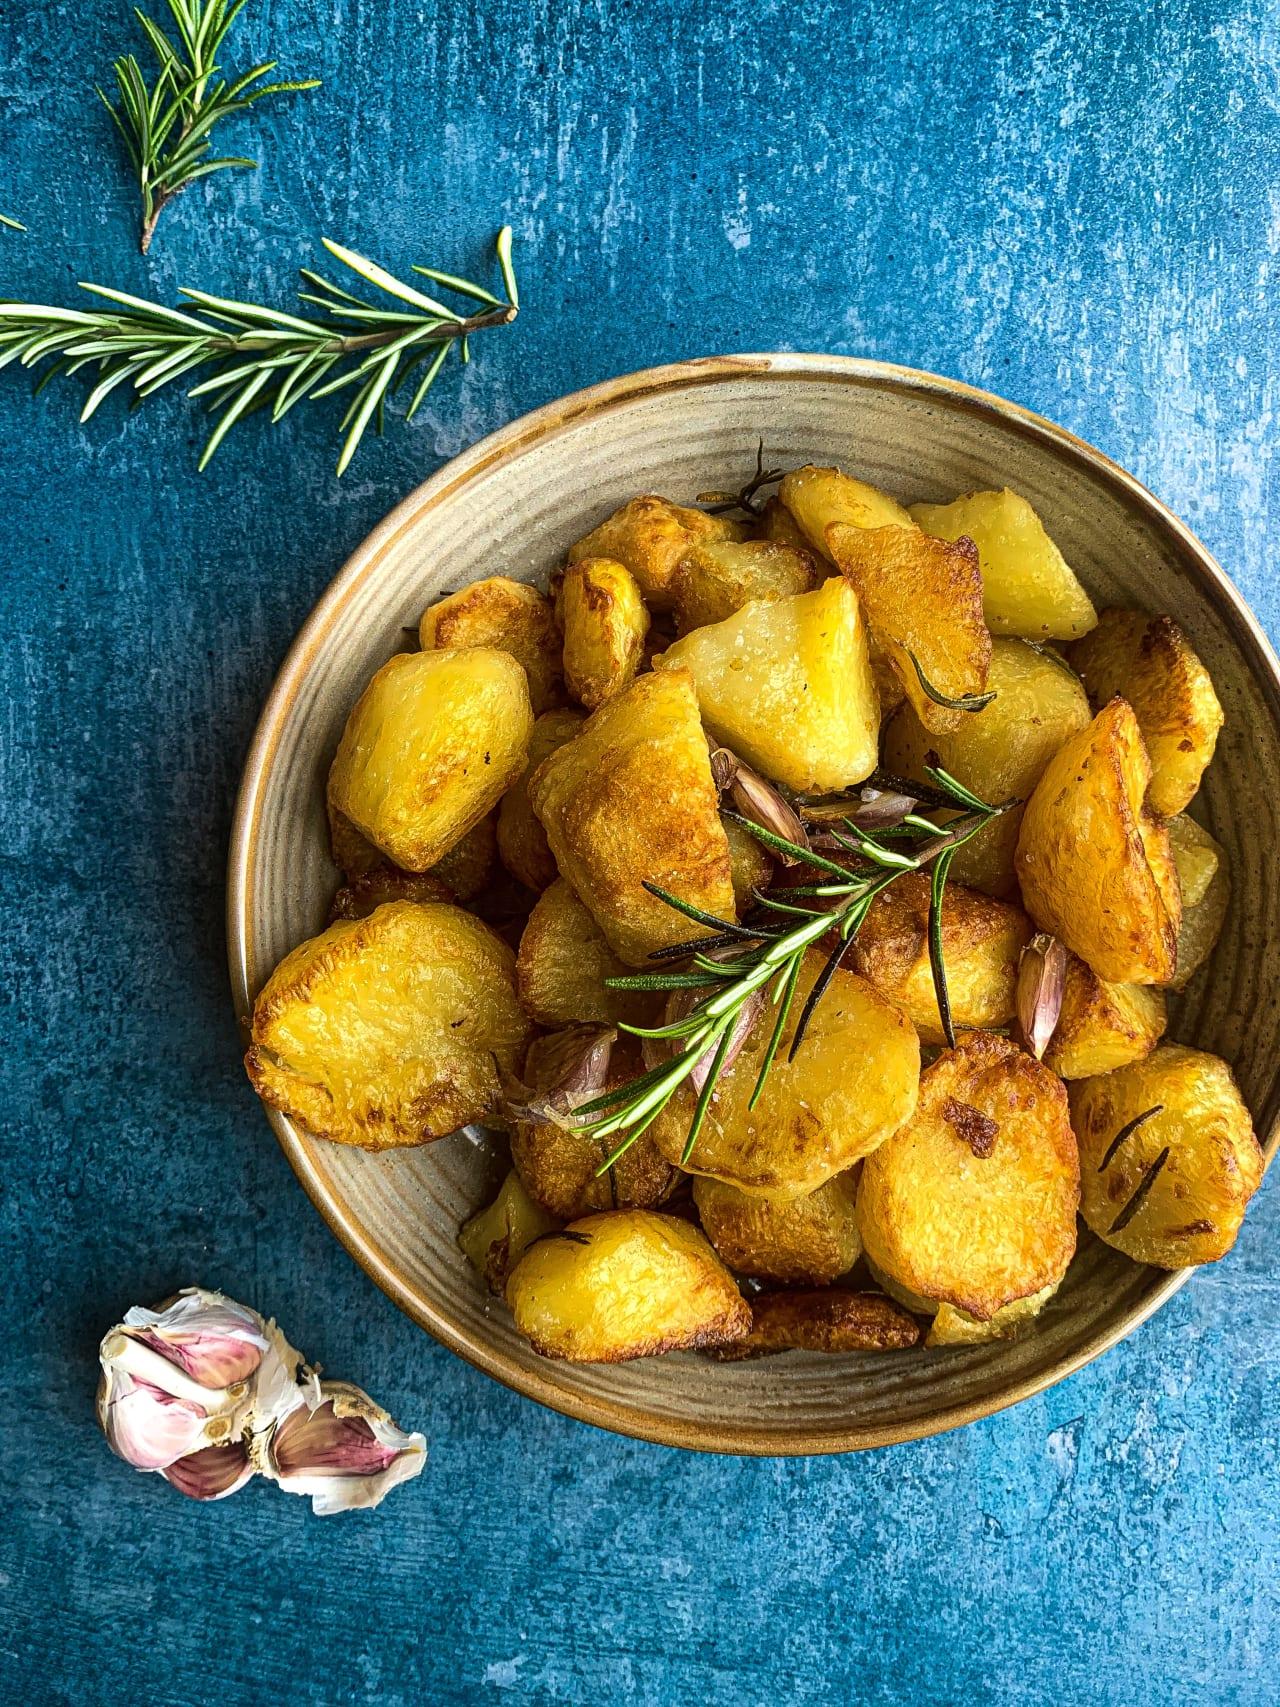 Garlic, Rosemary and Thyme Roast Potatoes